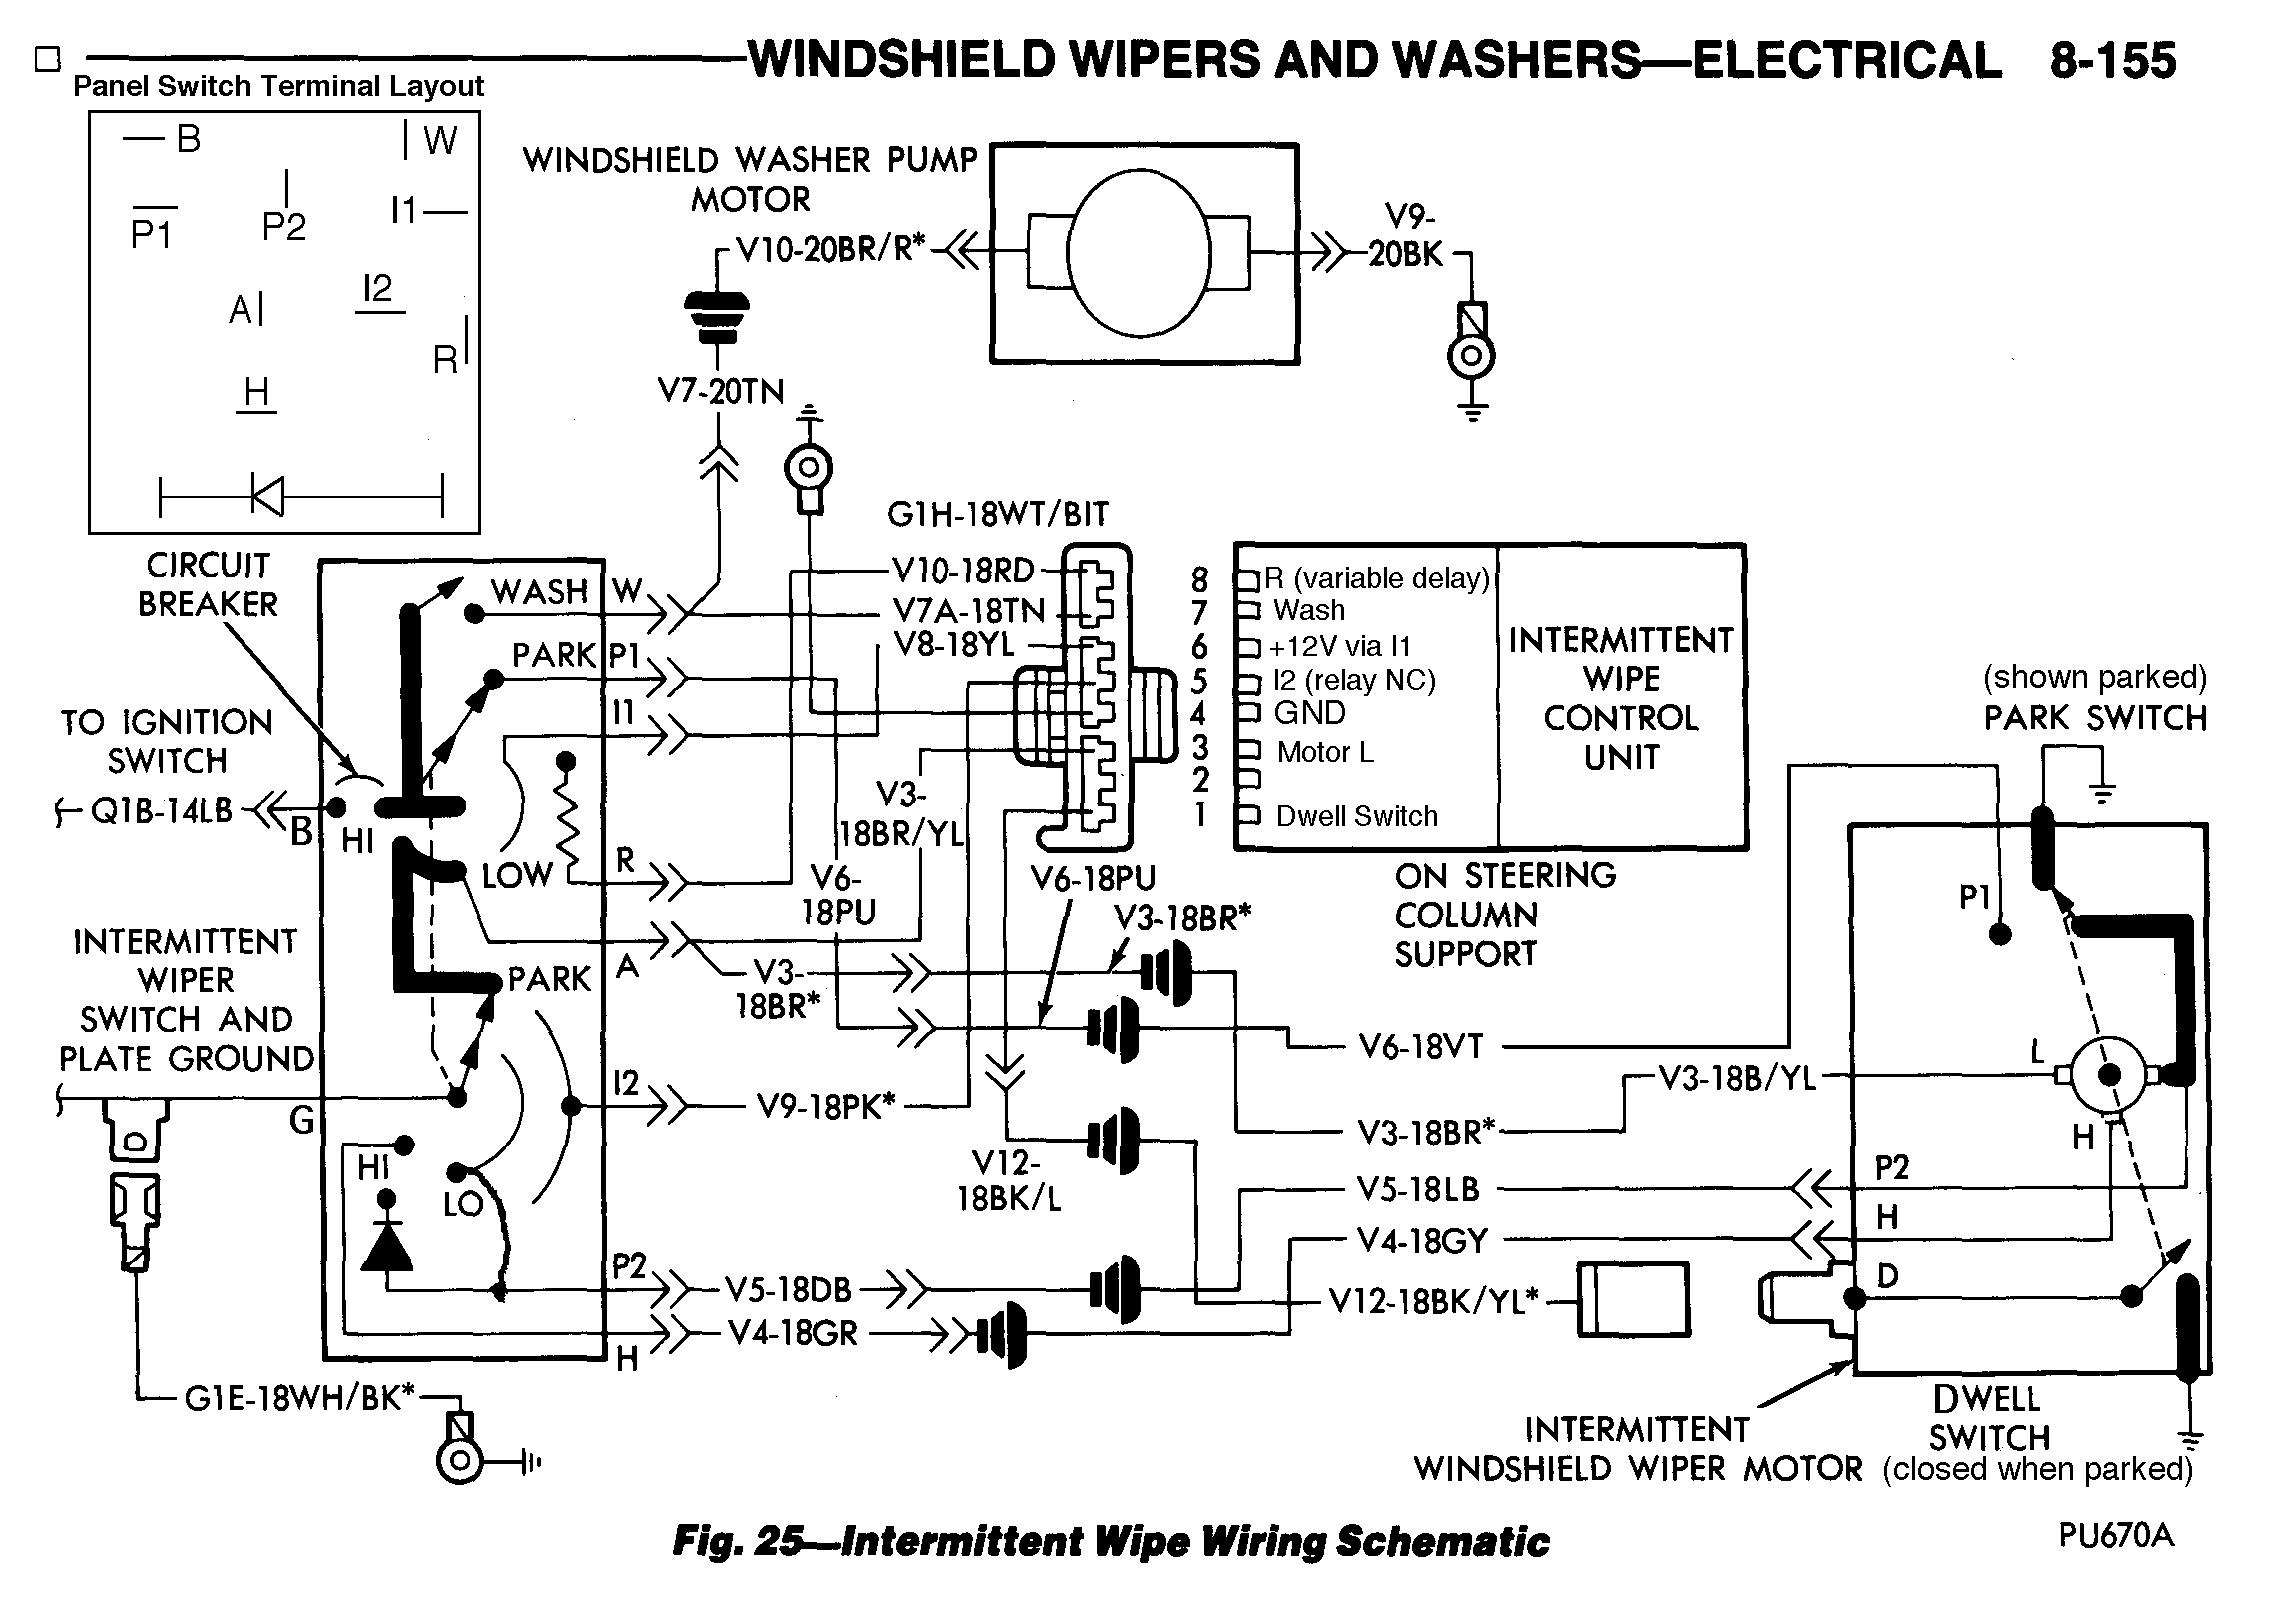 chrysler intermittent (delay) wiper fix normal car wiring diagrams honda car wiring diagrams #8